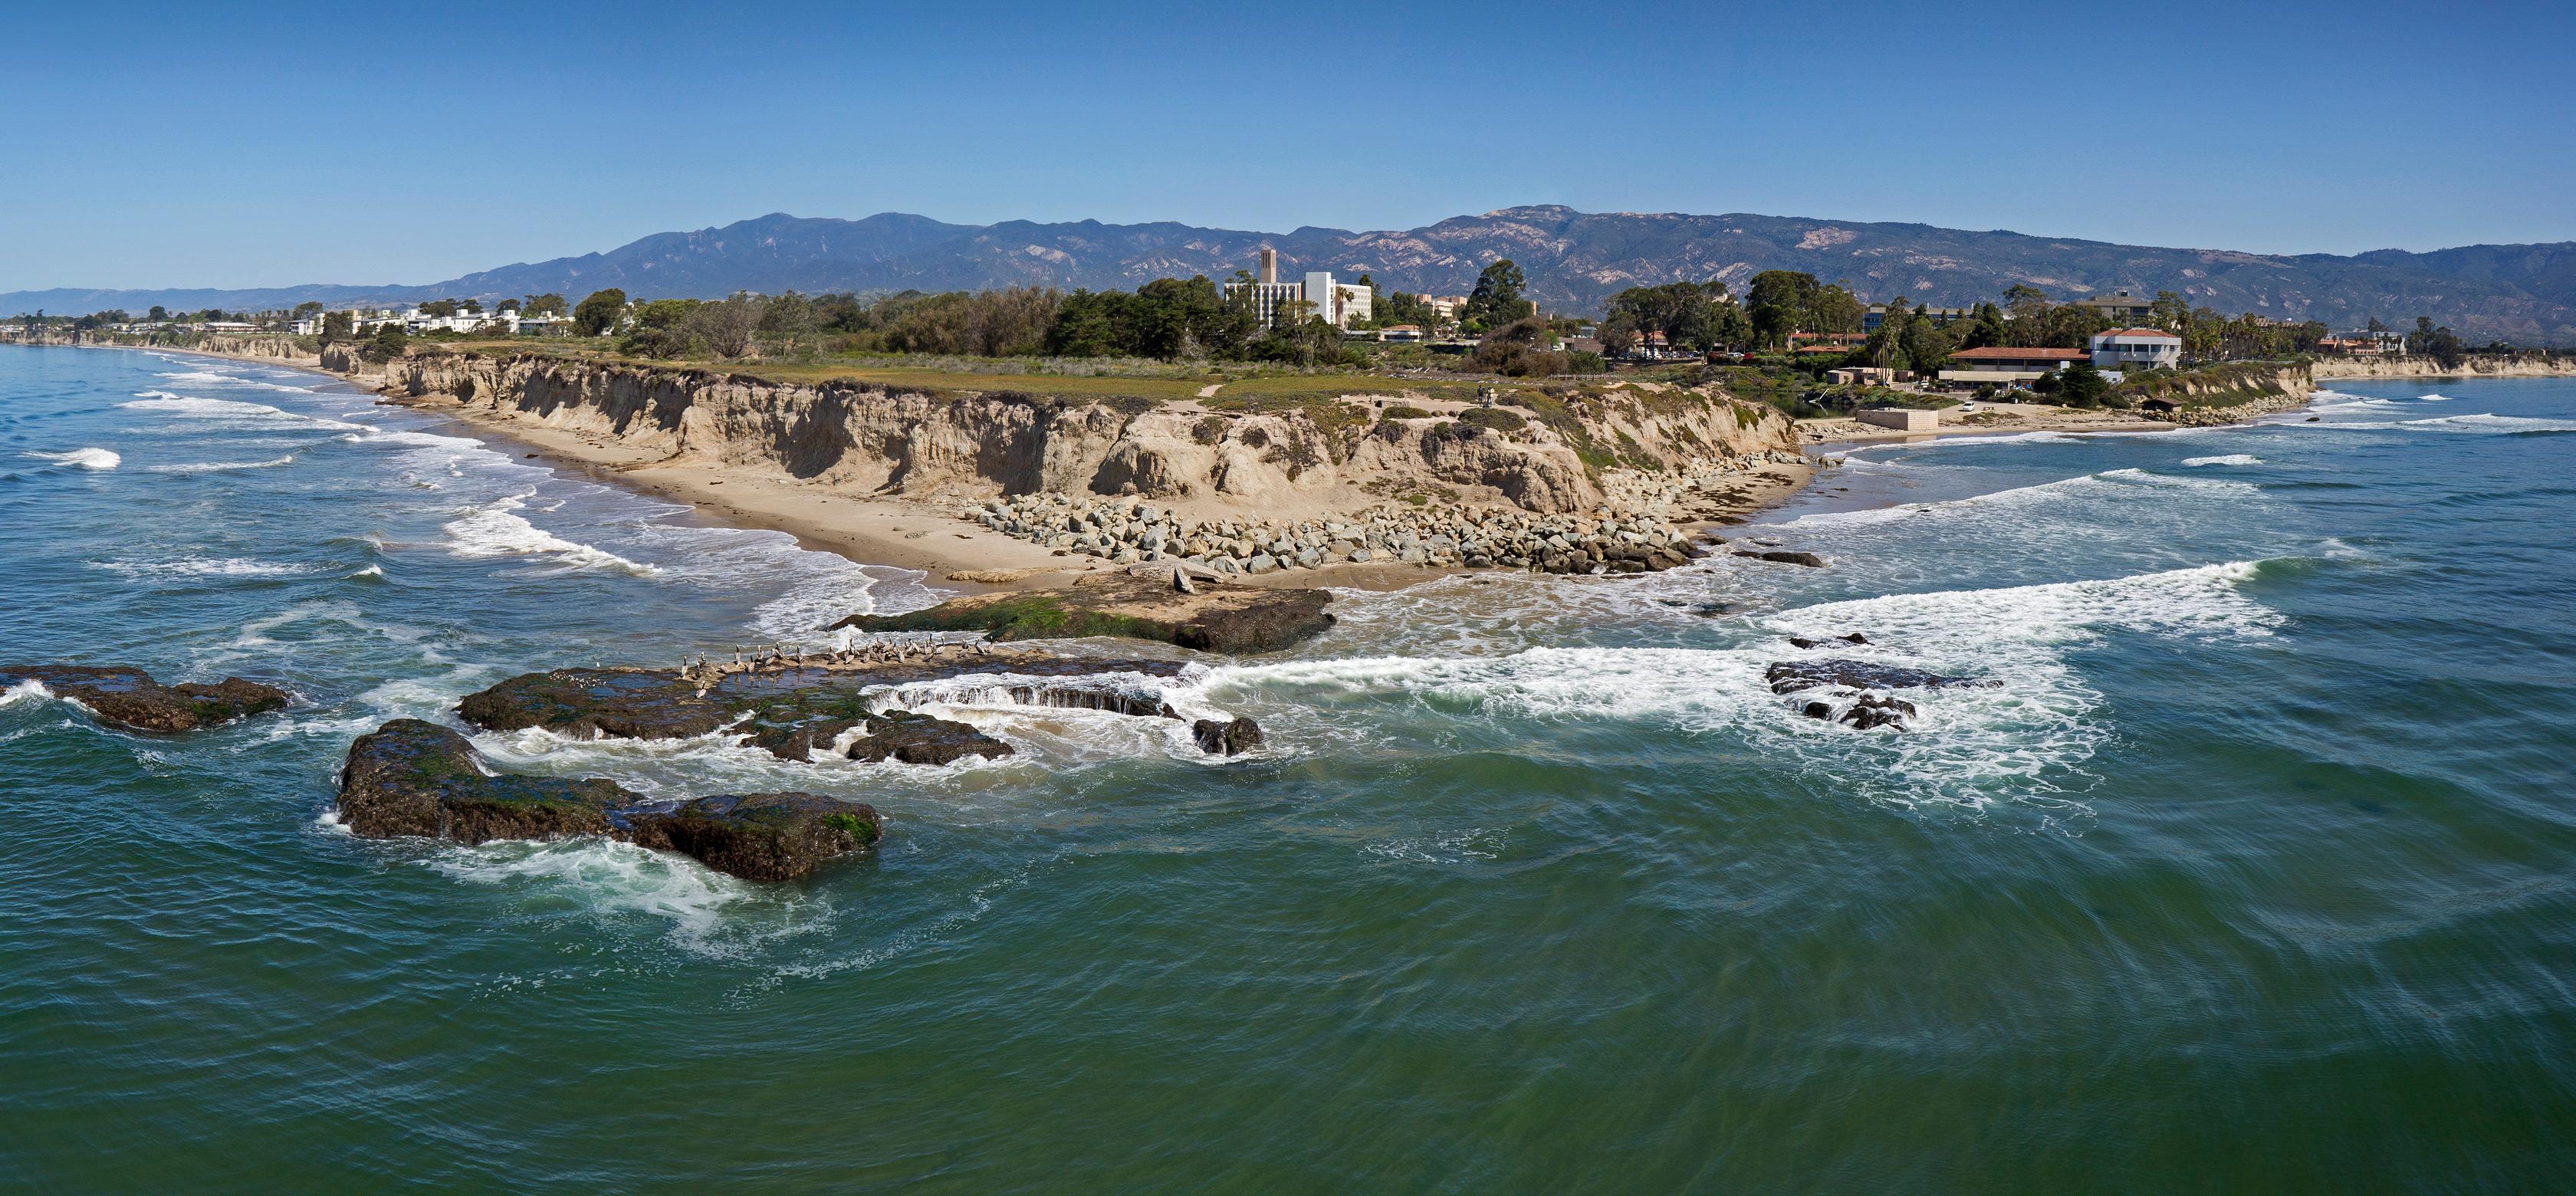 Edge of UC Santa Barbara campus